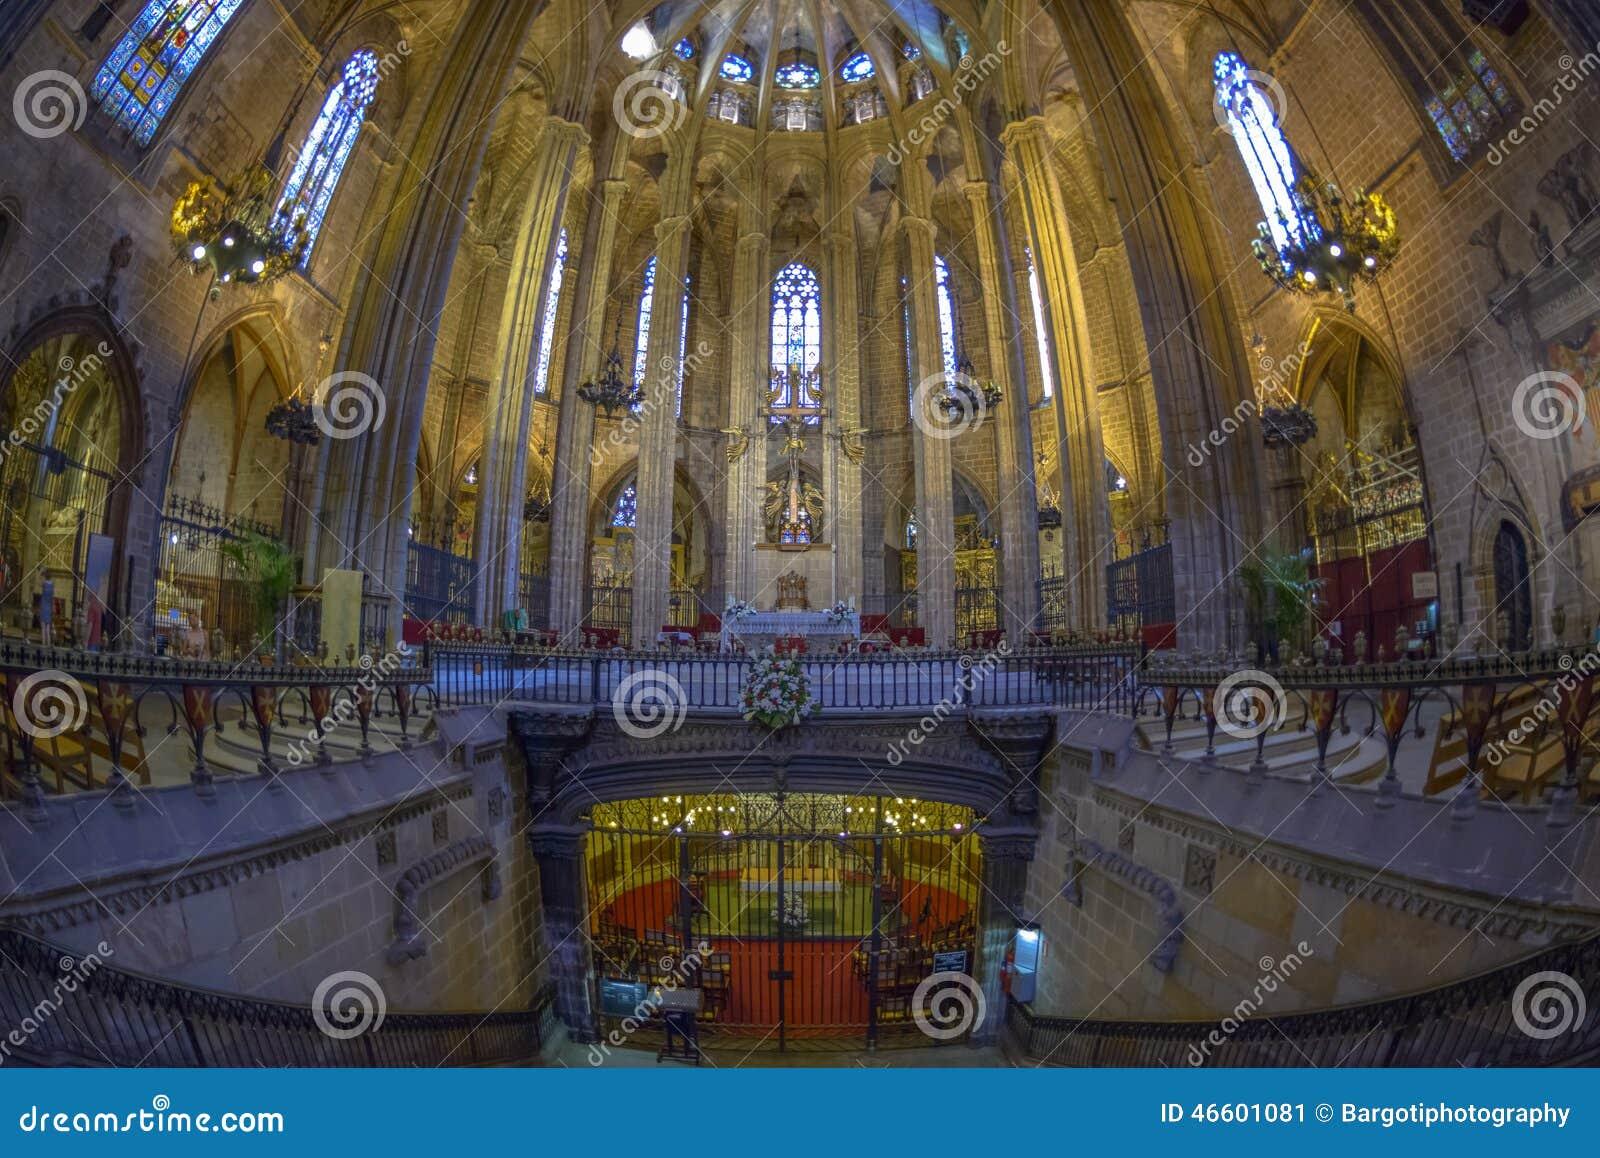 Interior de la catedral de barcelona catalu a espa a for Interior de la catedral de barcelona